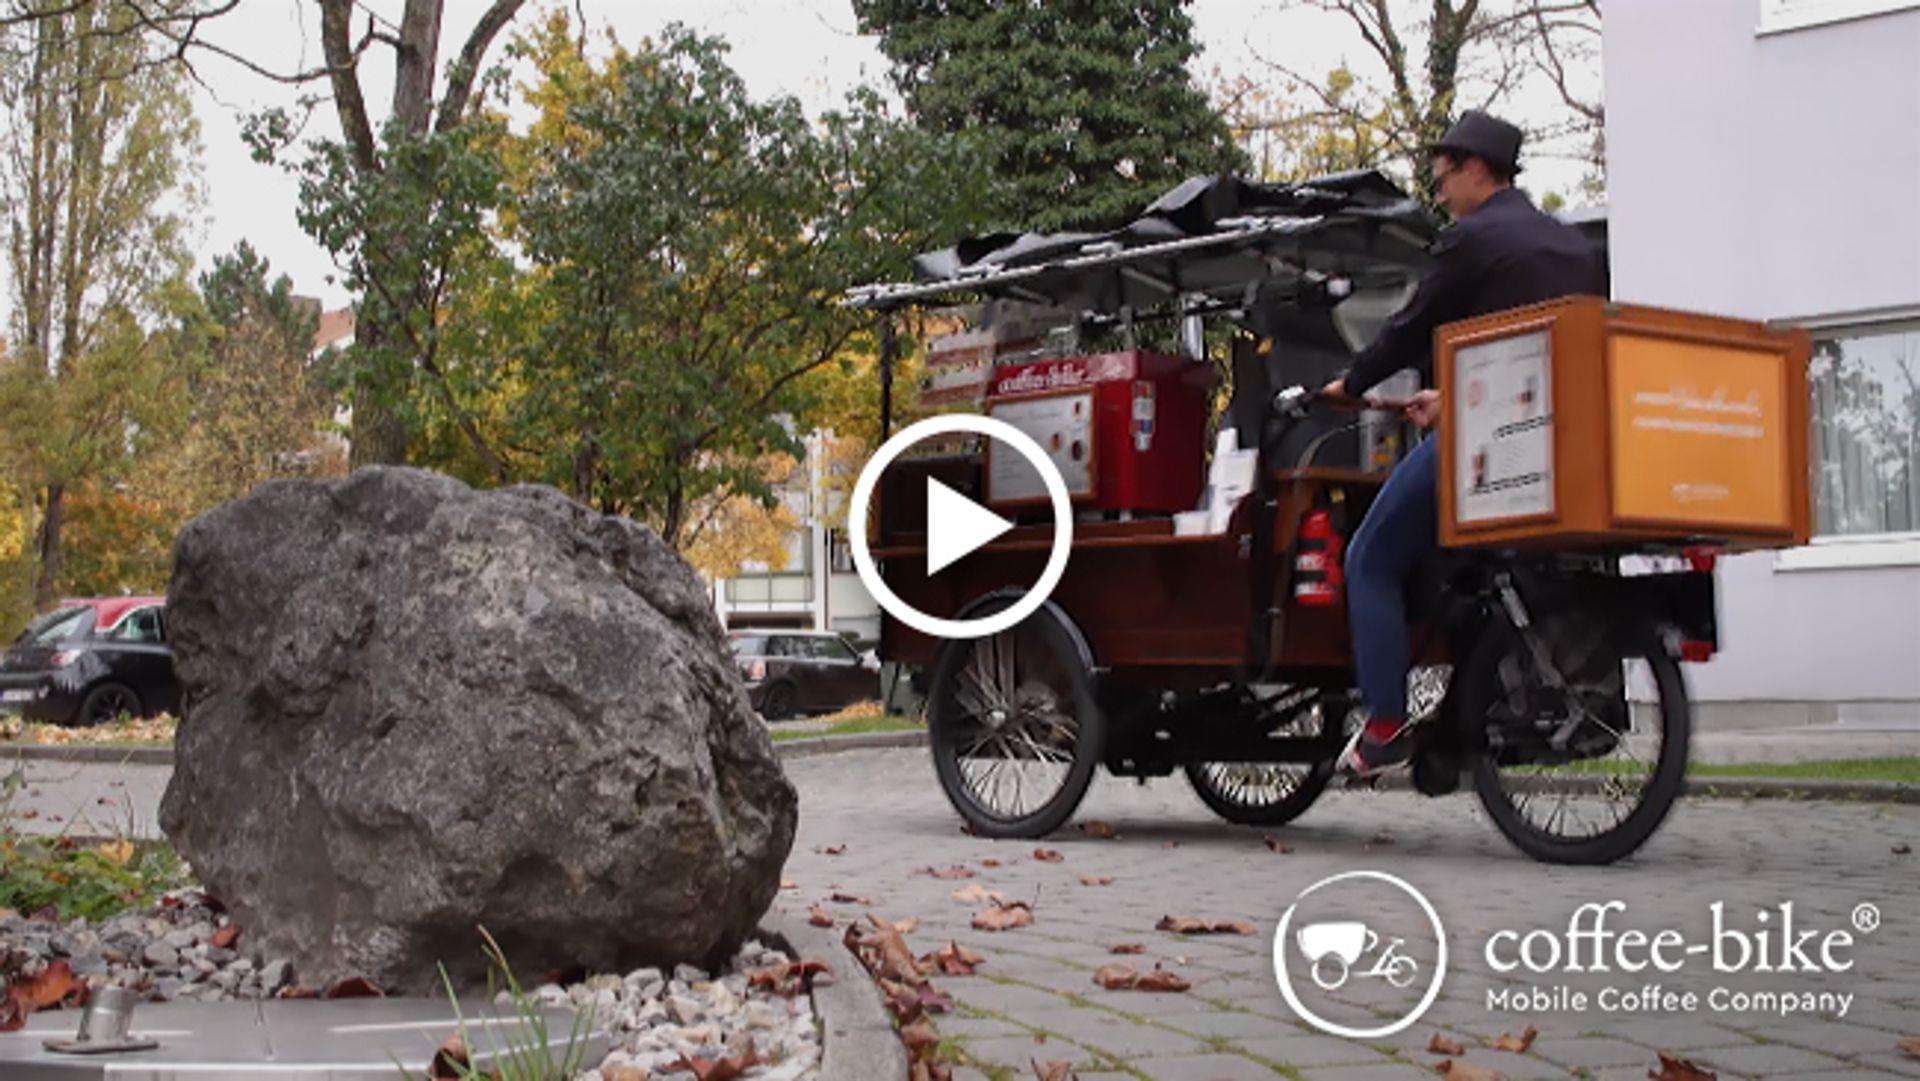 Coffee-Bike Starthilfe sichern: 6 Monate mietfrei mit mobilem Kaffeecatering